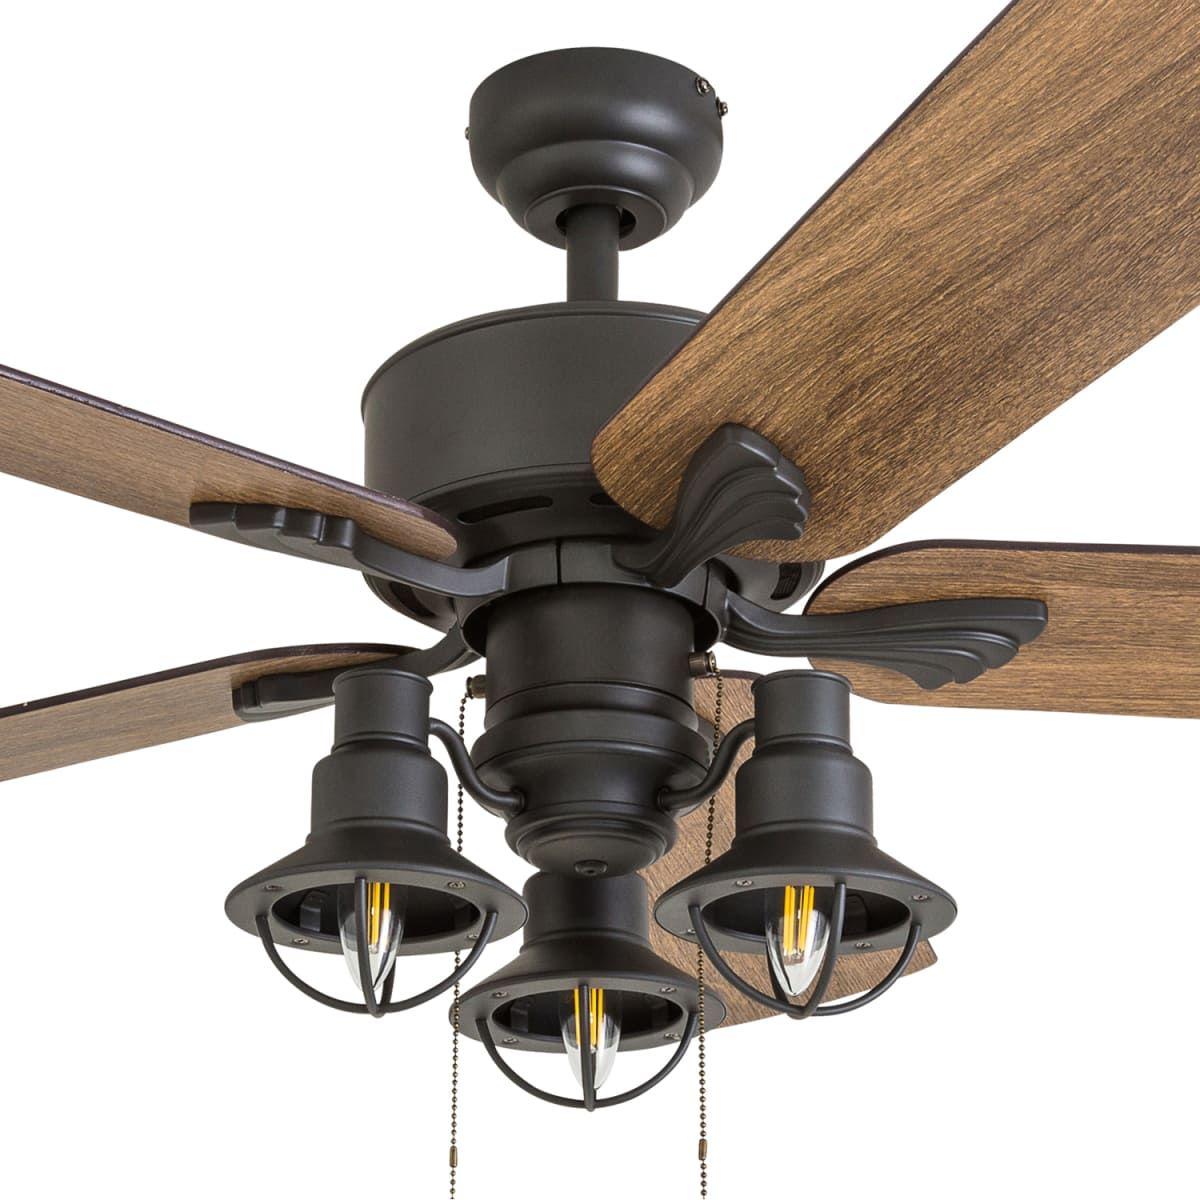 Prominence Home Sivan in 2020 Ceiling fan, Black ceiling